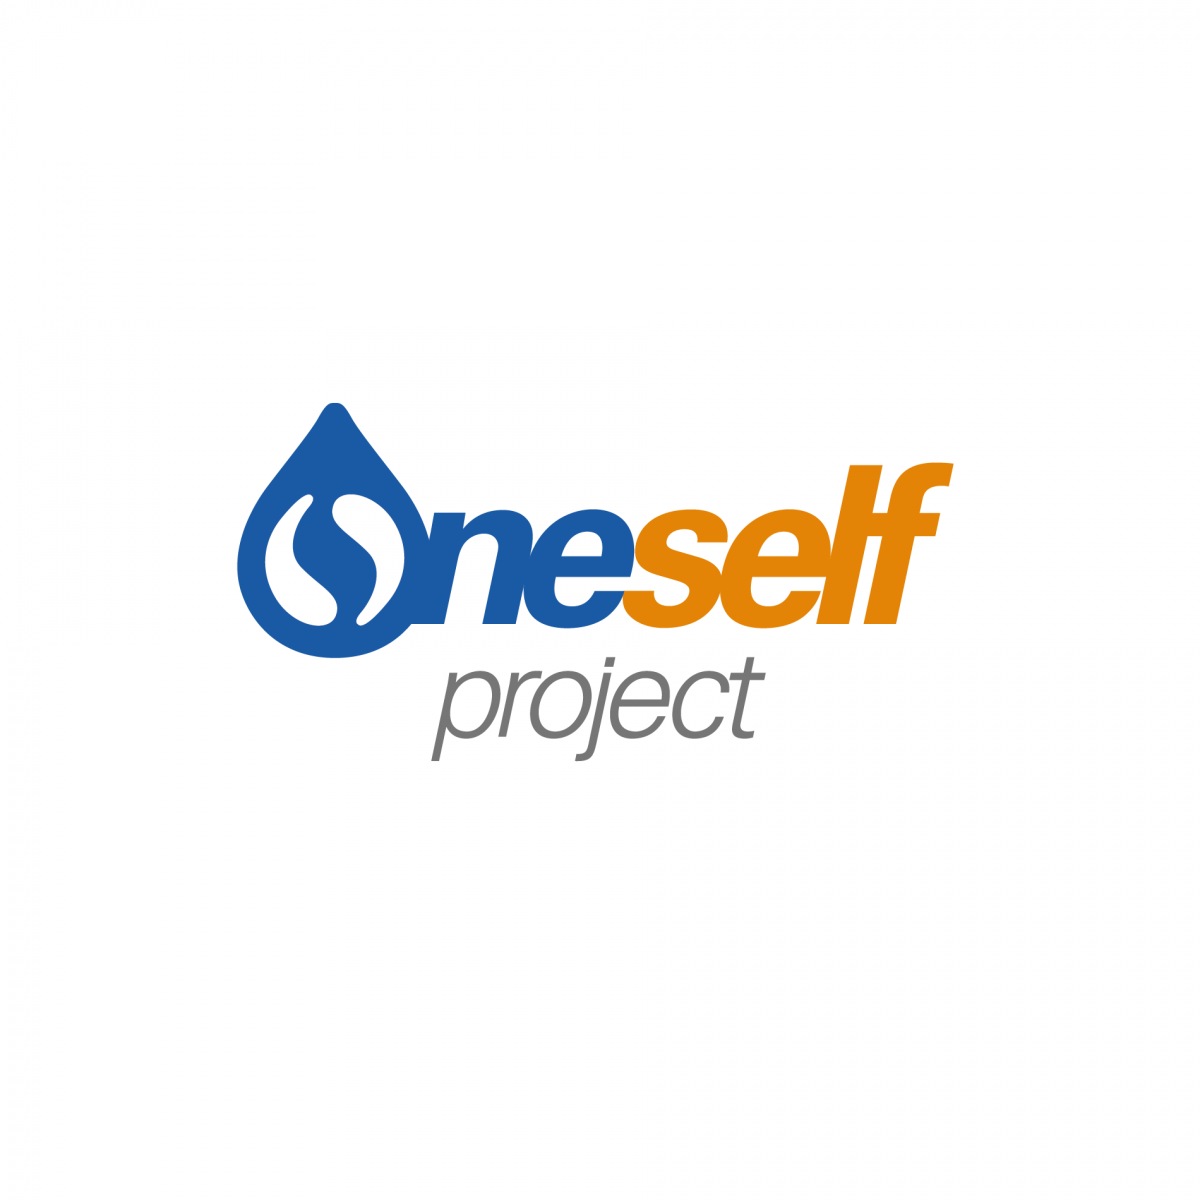 Oneself Project ワンセルフ・プロジェクト - 横浜建物管理協同組合|Identity CI VI ロゴシンボル|横浜市